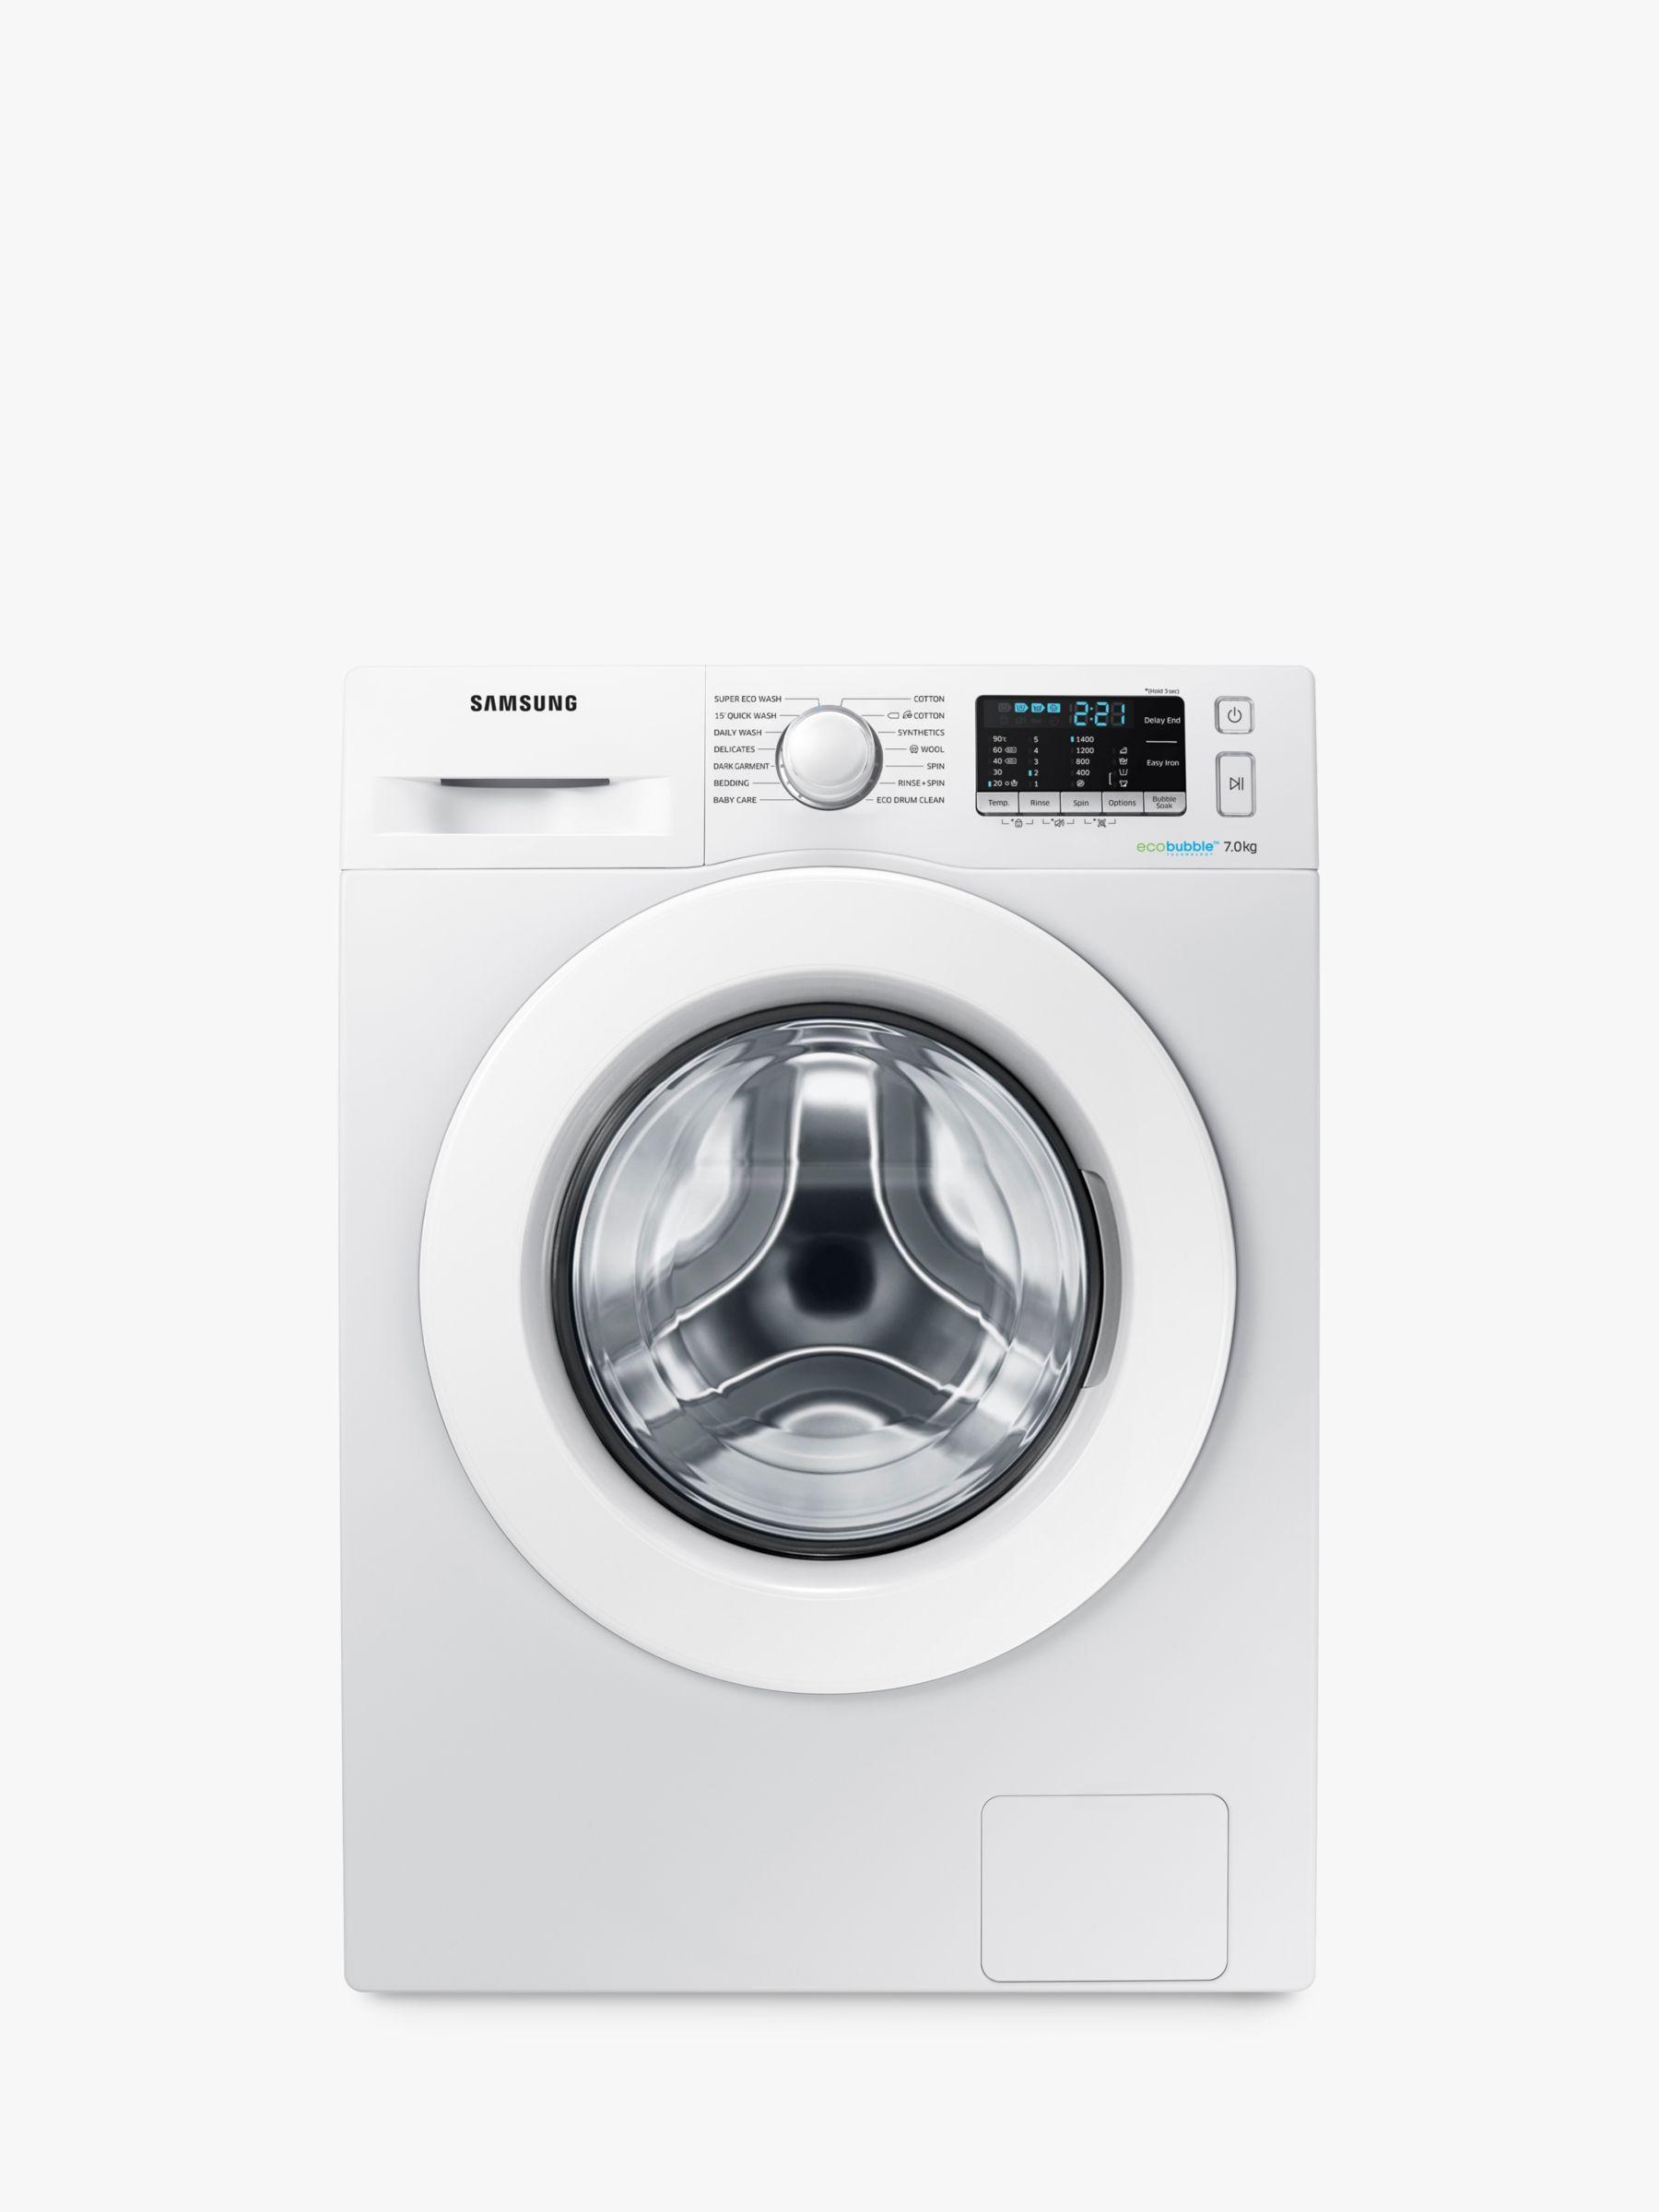 Samsung Samsung WW70J5555MW/EU ecobubble™ Freestanding Washing Machine, 7kg Load, A+++ Energy Rating, 1400rpm Spin, White